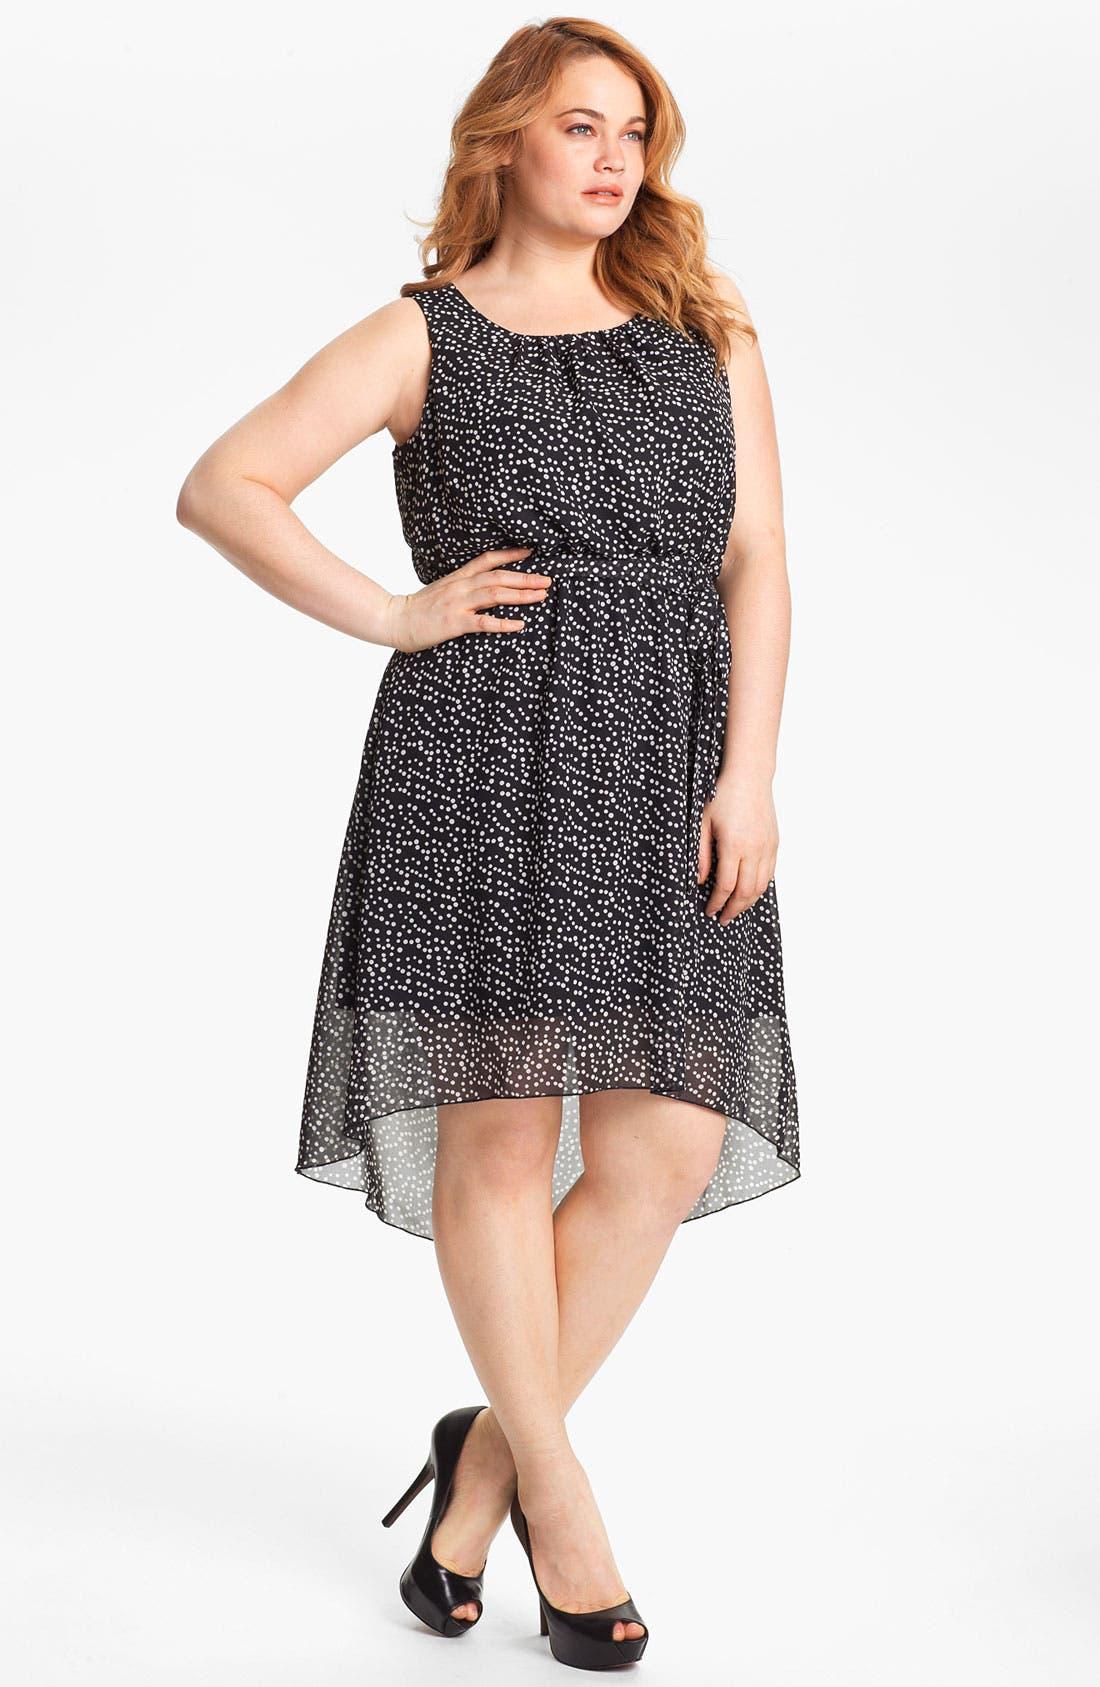 Main Image - Evans Polka Dot High/Low Chiffon Dress (Plus Size)